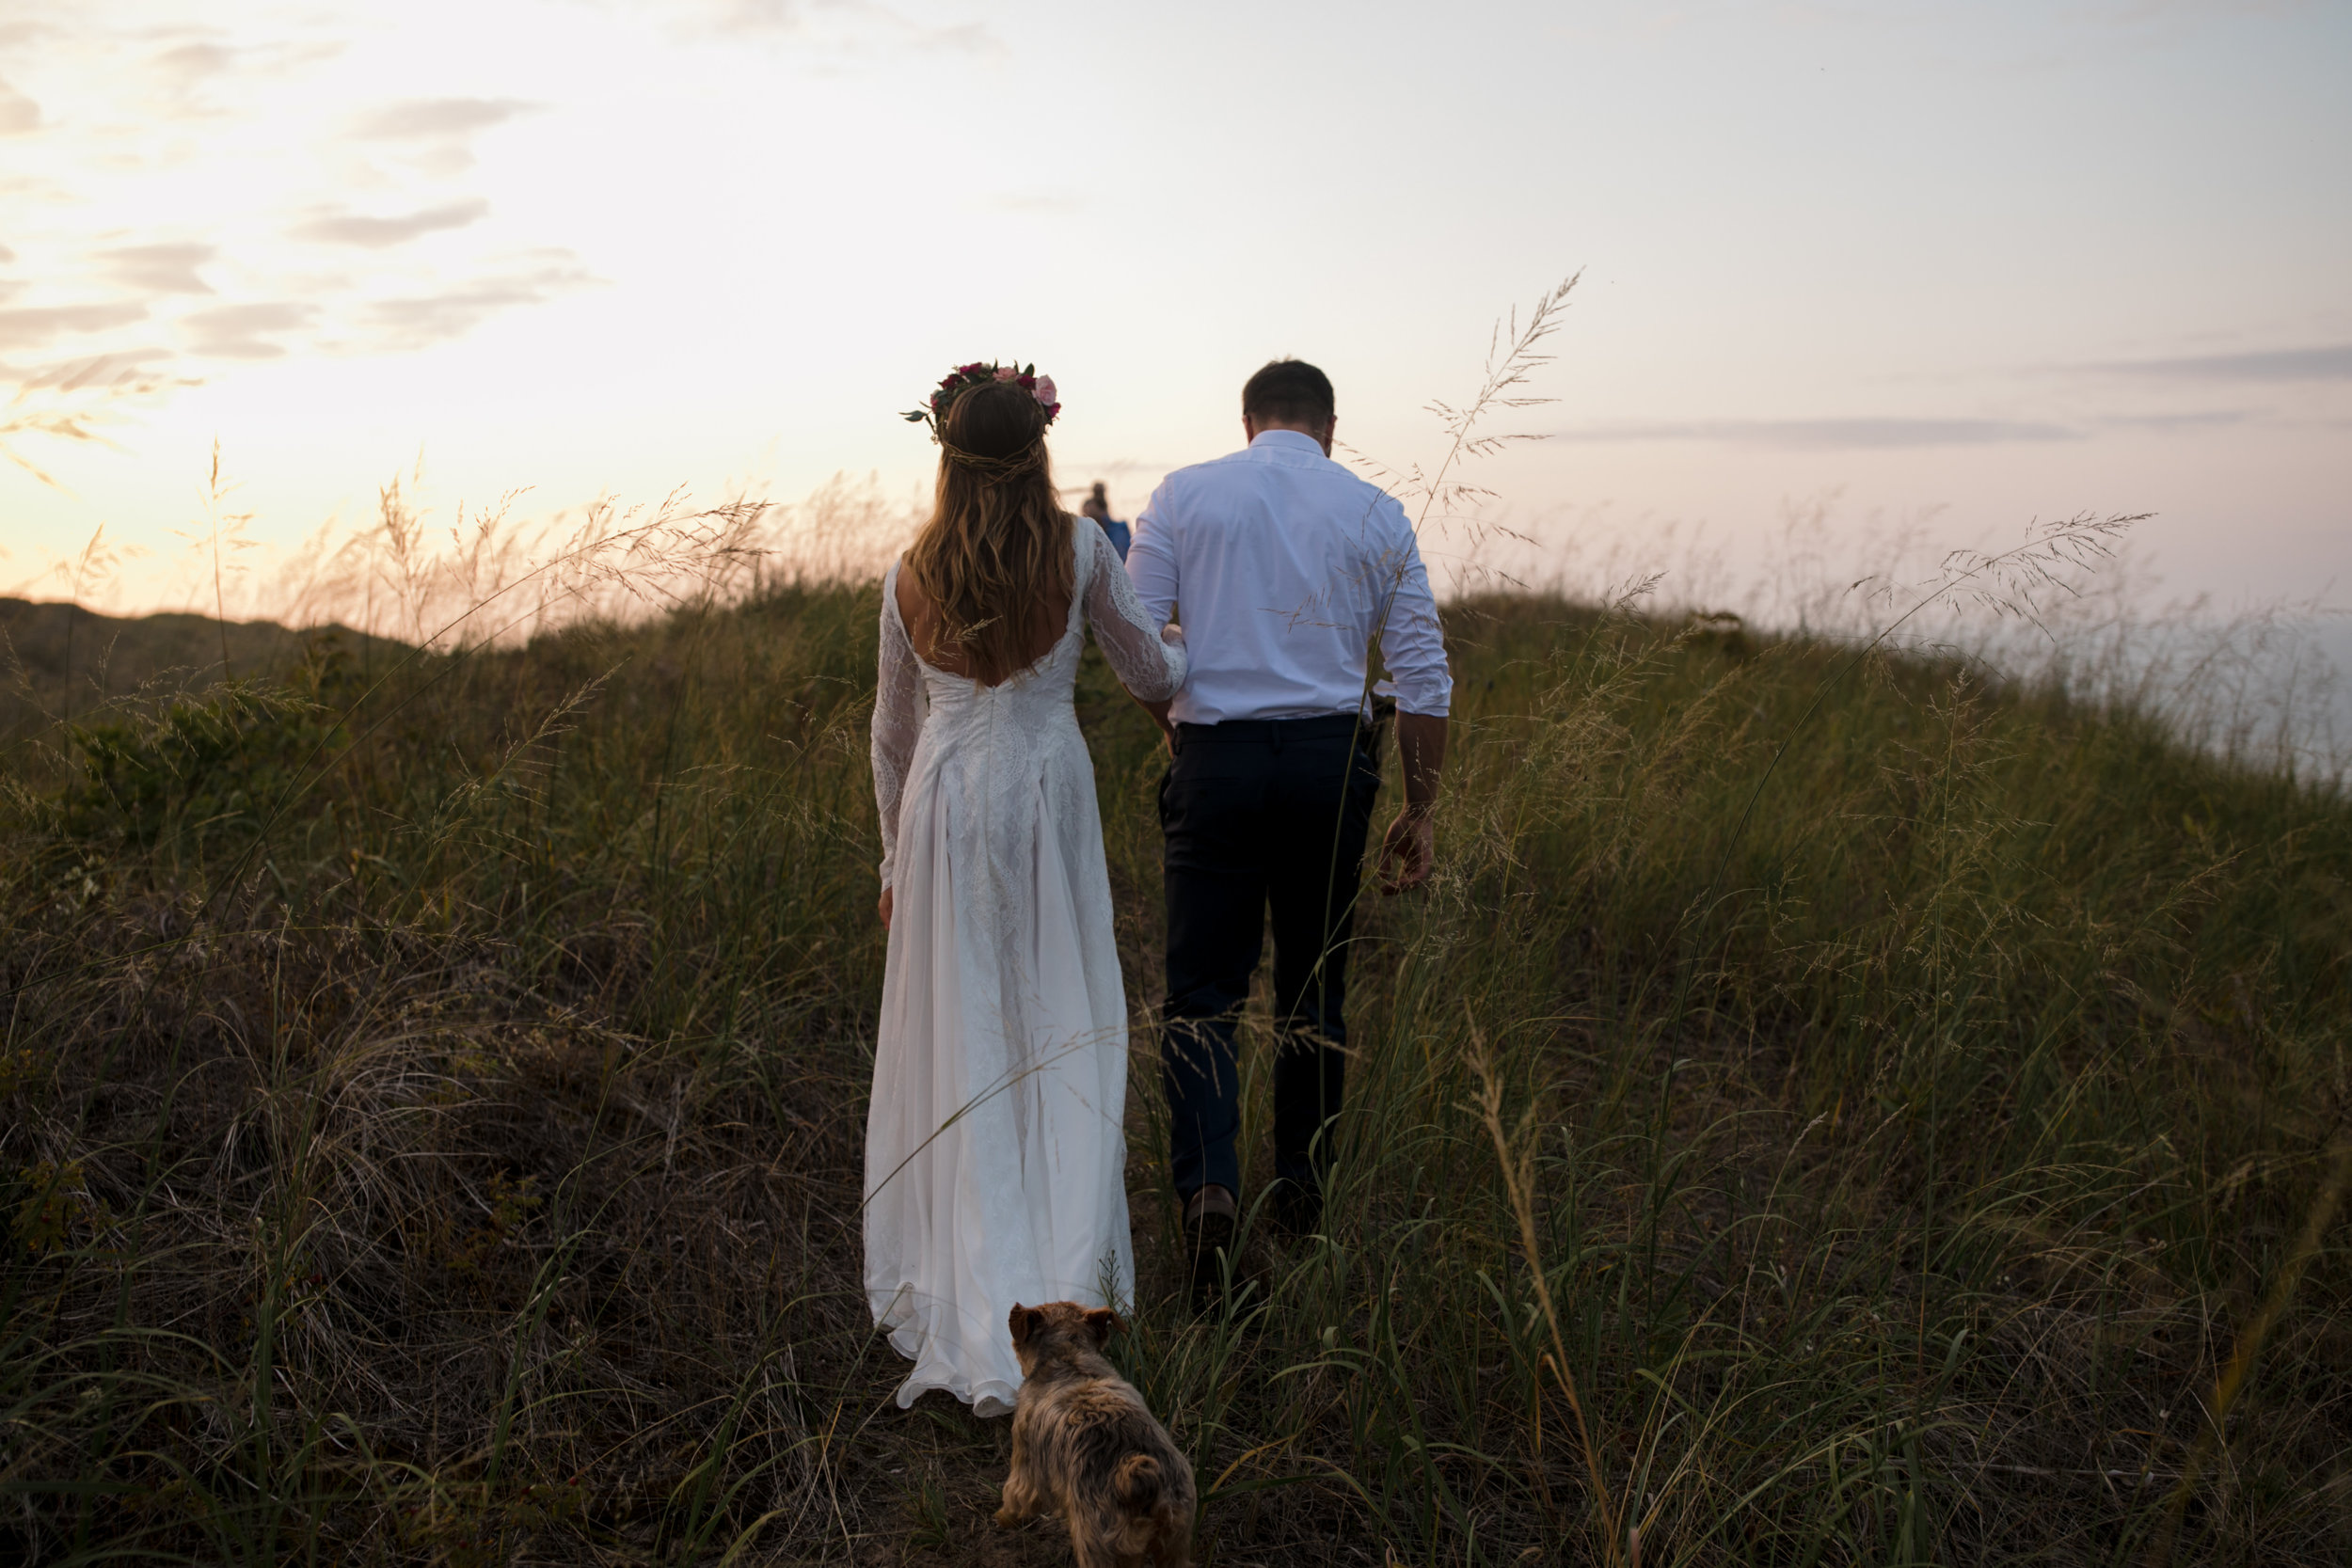 michigan-emotive-photographer-moonlight-elopement-mariha-hunter-121.jpg